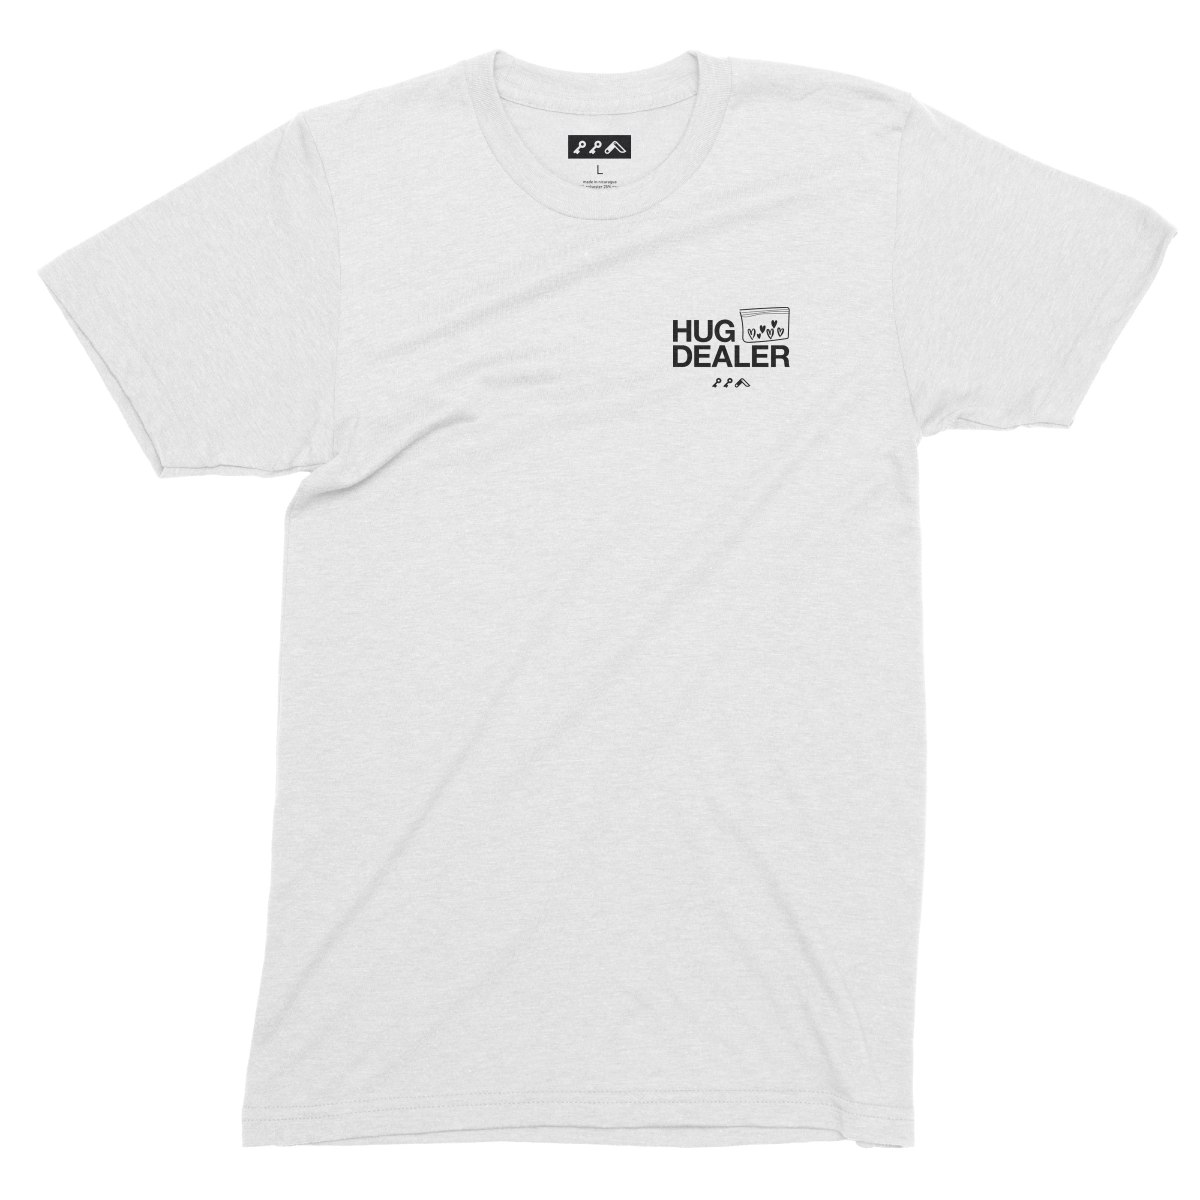 HUG DEALER shirt in white by kikicutt t-shirt store